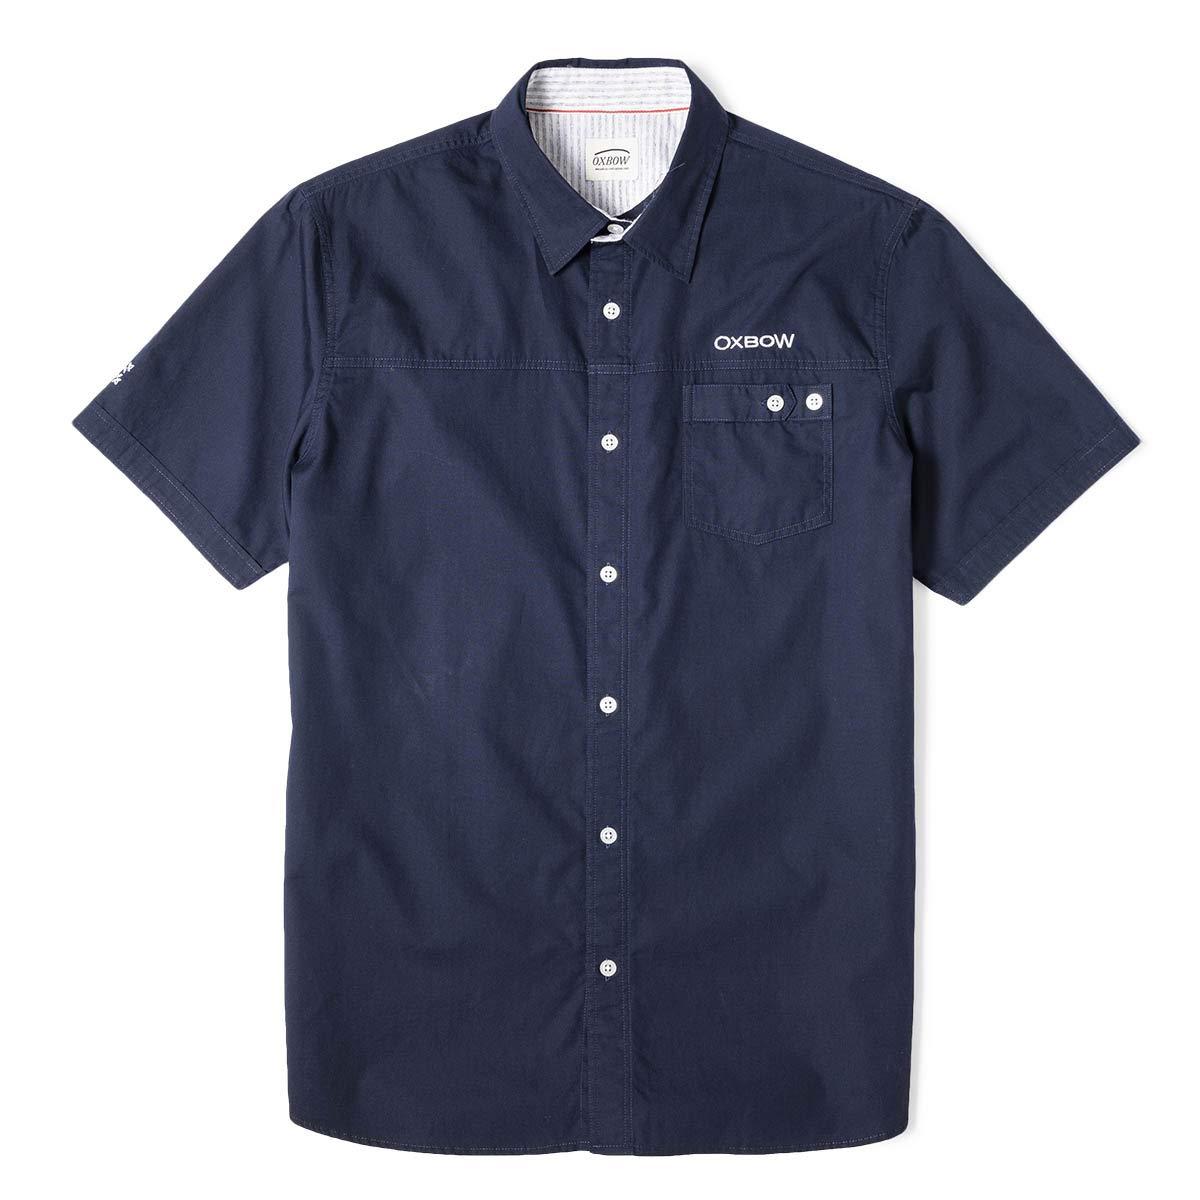 Camicia Uomo Oxbow Cantana